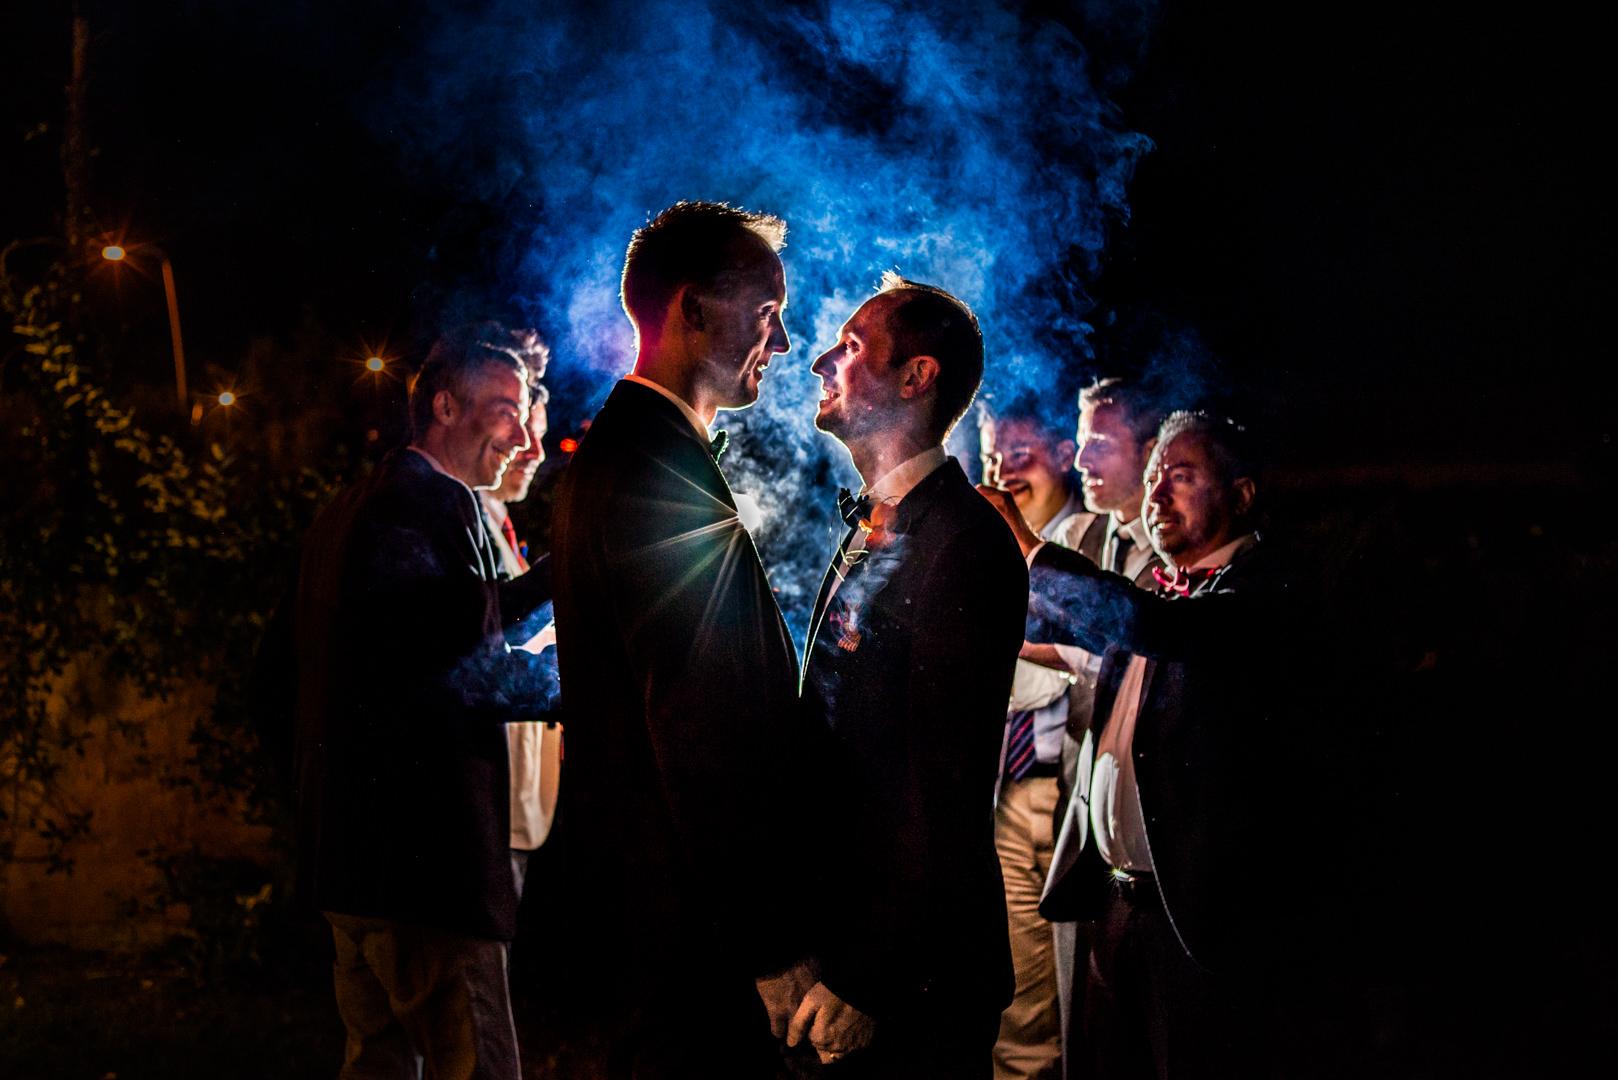 Same-sex-wedding-barcelona-boda- gay-samesex-engagement-Rafael-Torres-fotografo-bodas-sevilla-madrid-barcelona-wedding-photographer--57.jpg